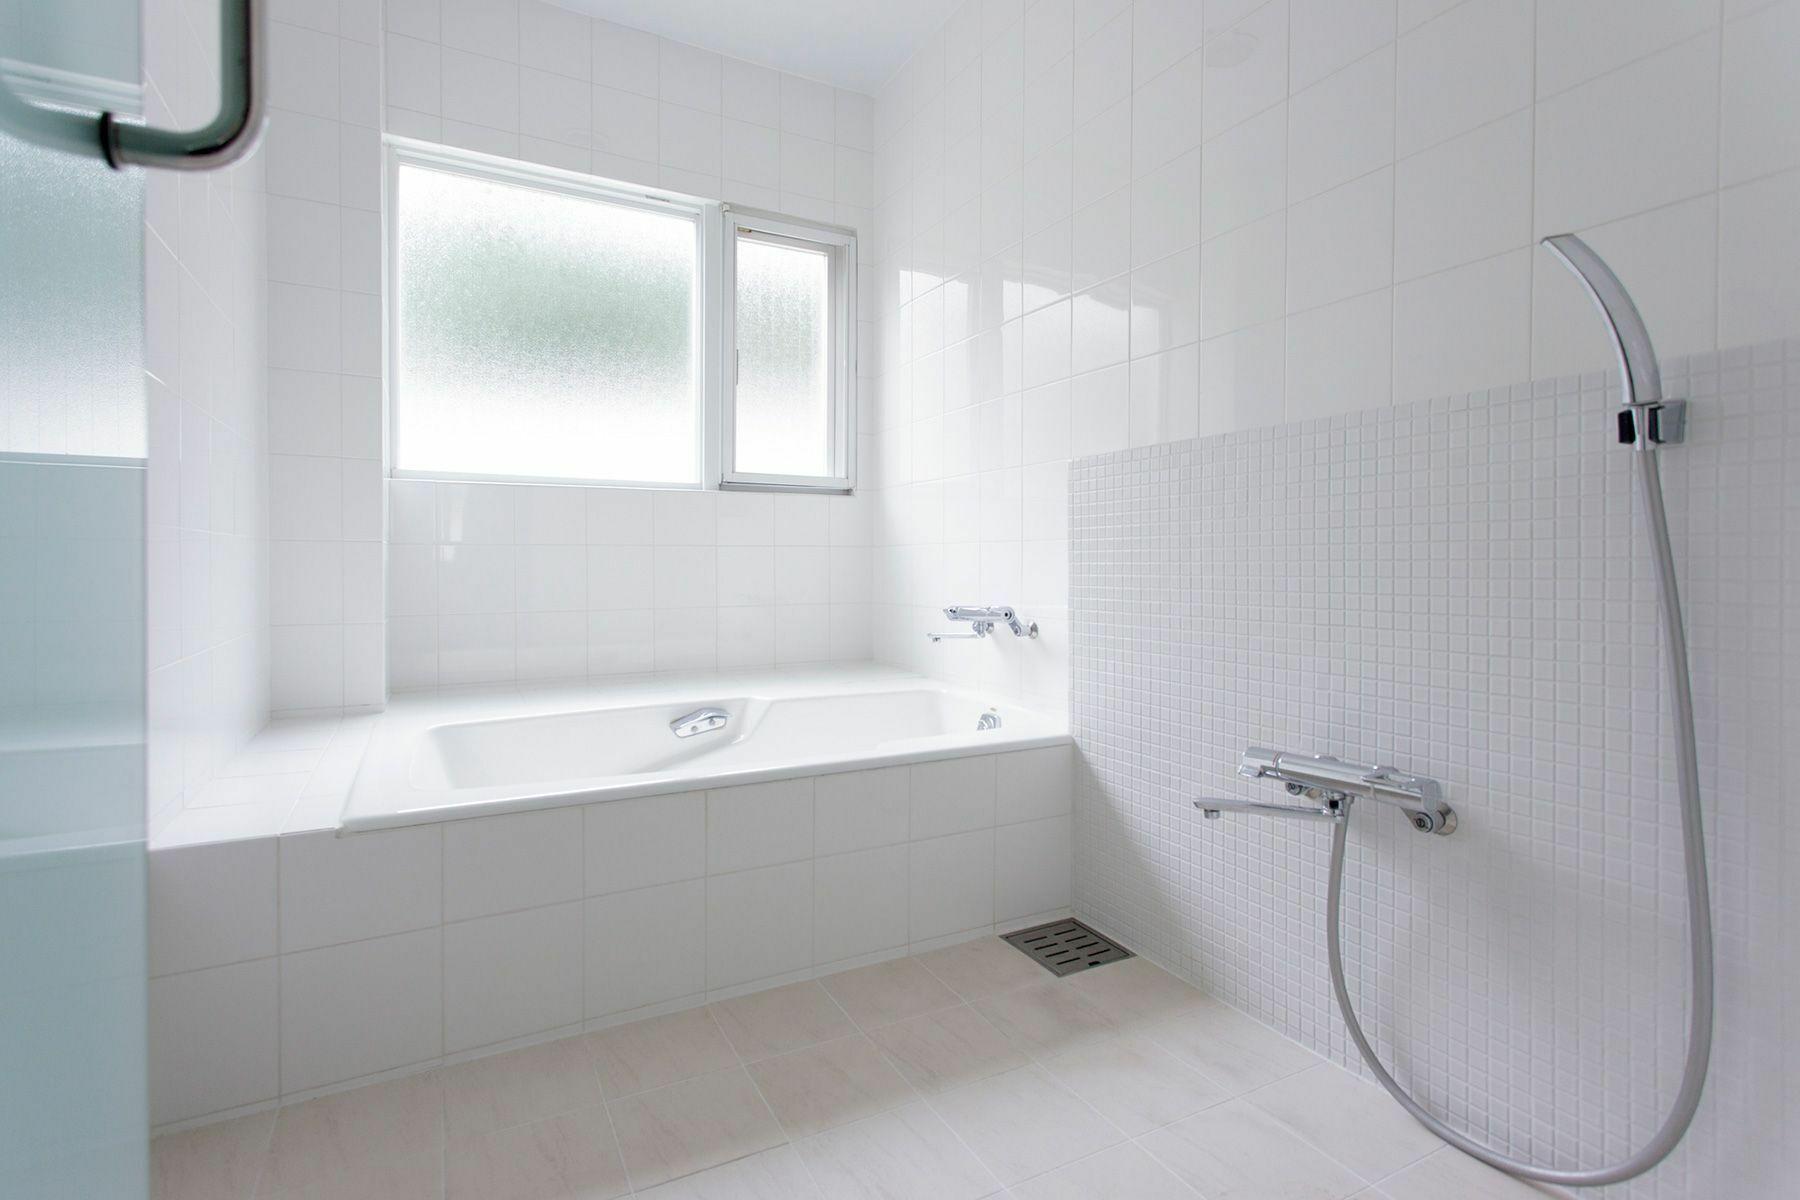 SHILO STUDIO MEGURO (シロスタジオ メグロ)1F 玄関から室内